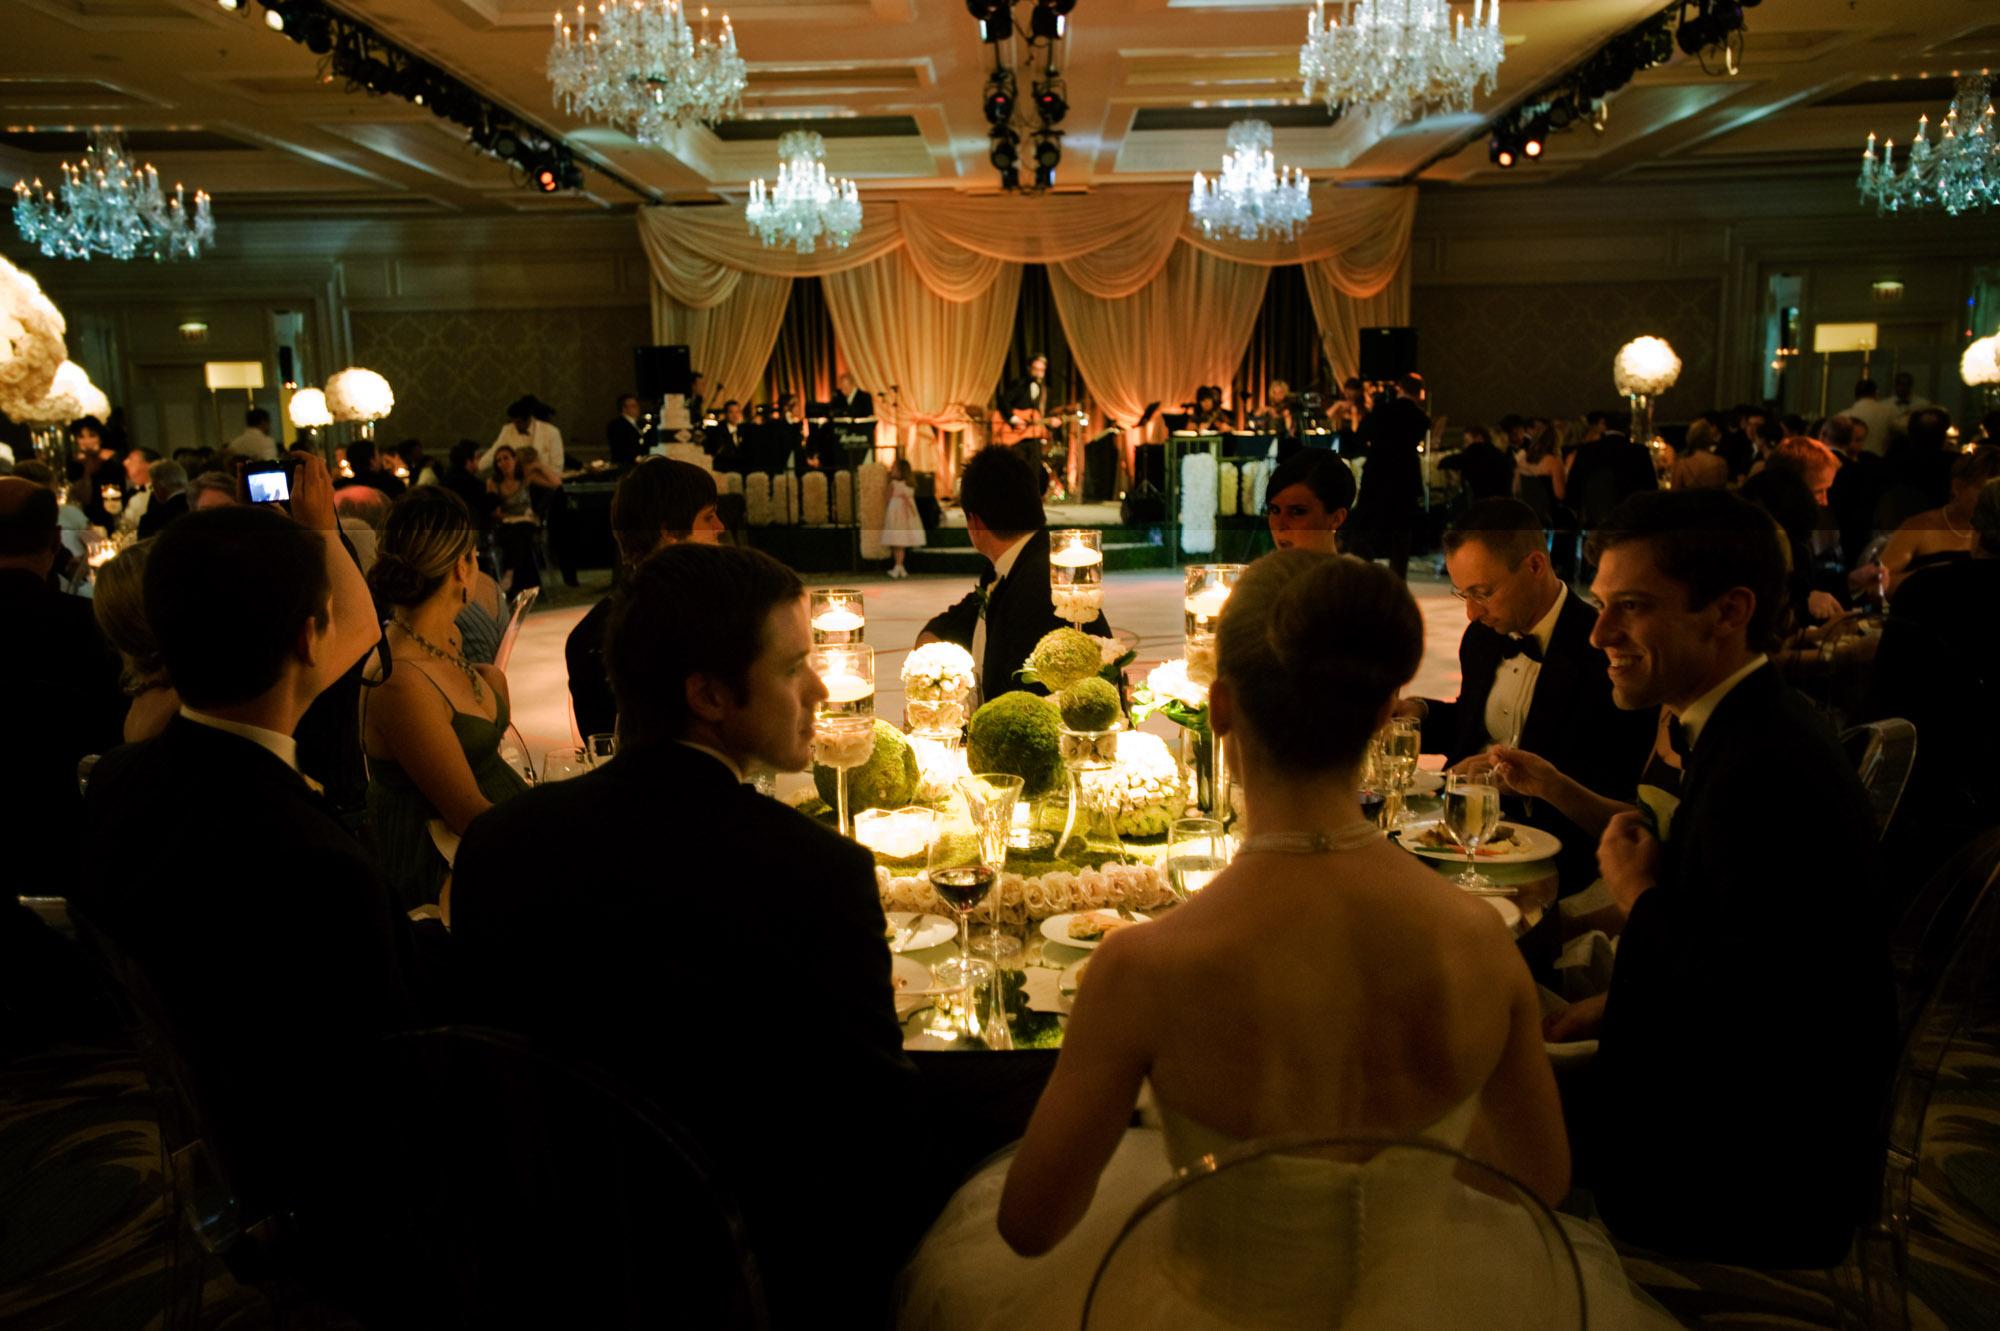 birch-bespoke-events-and-weddings-23.jpg